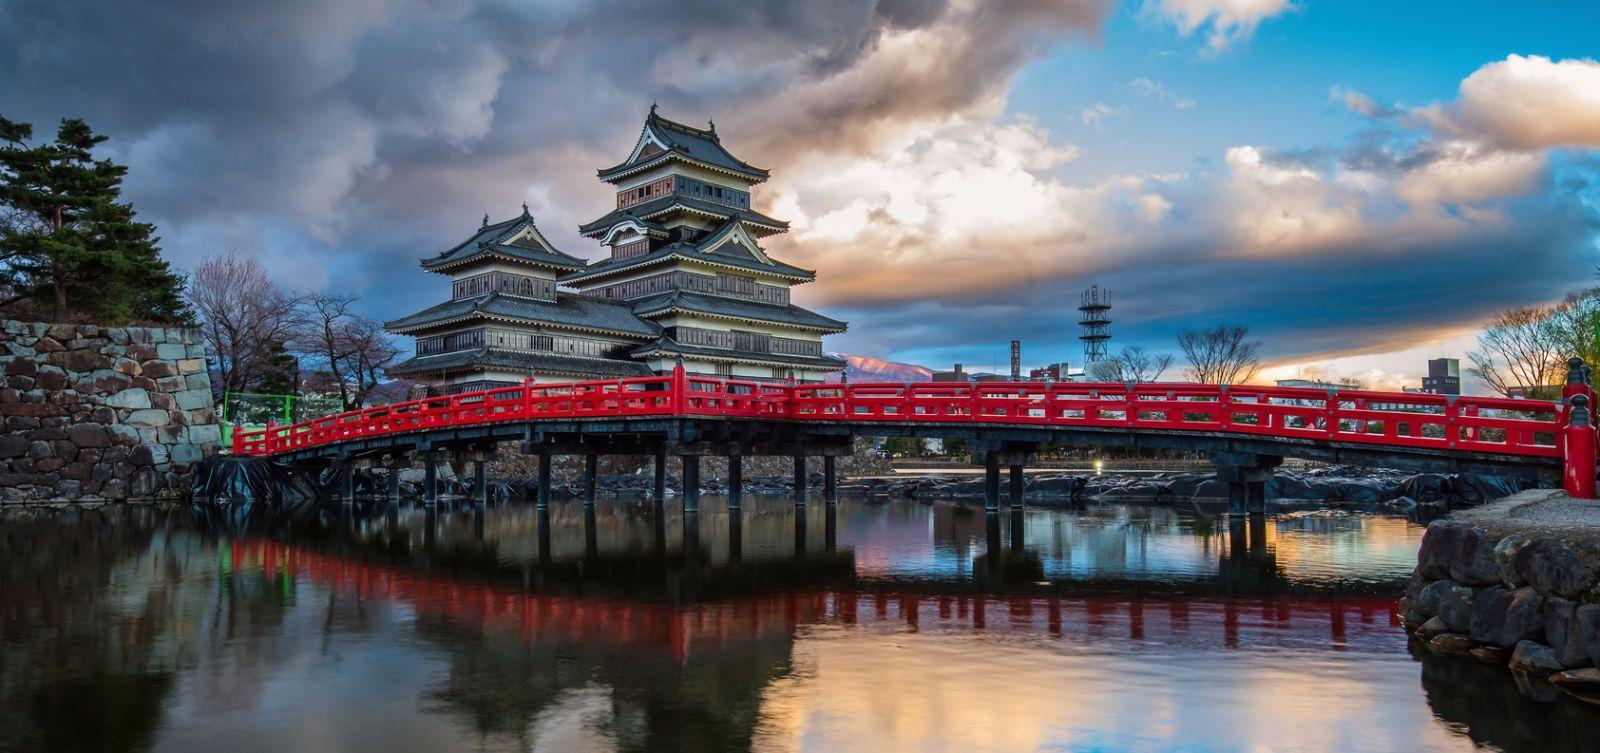 Viajar por libre a jap n tripperzone for Arquitectura japonesa tradicional